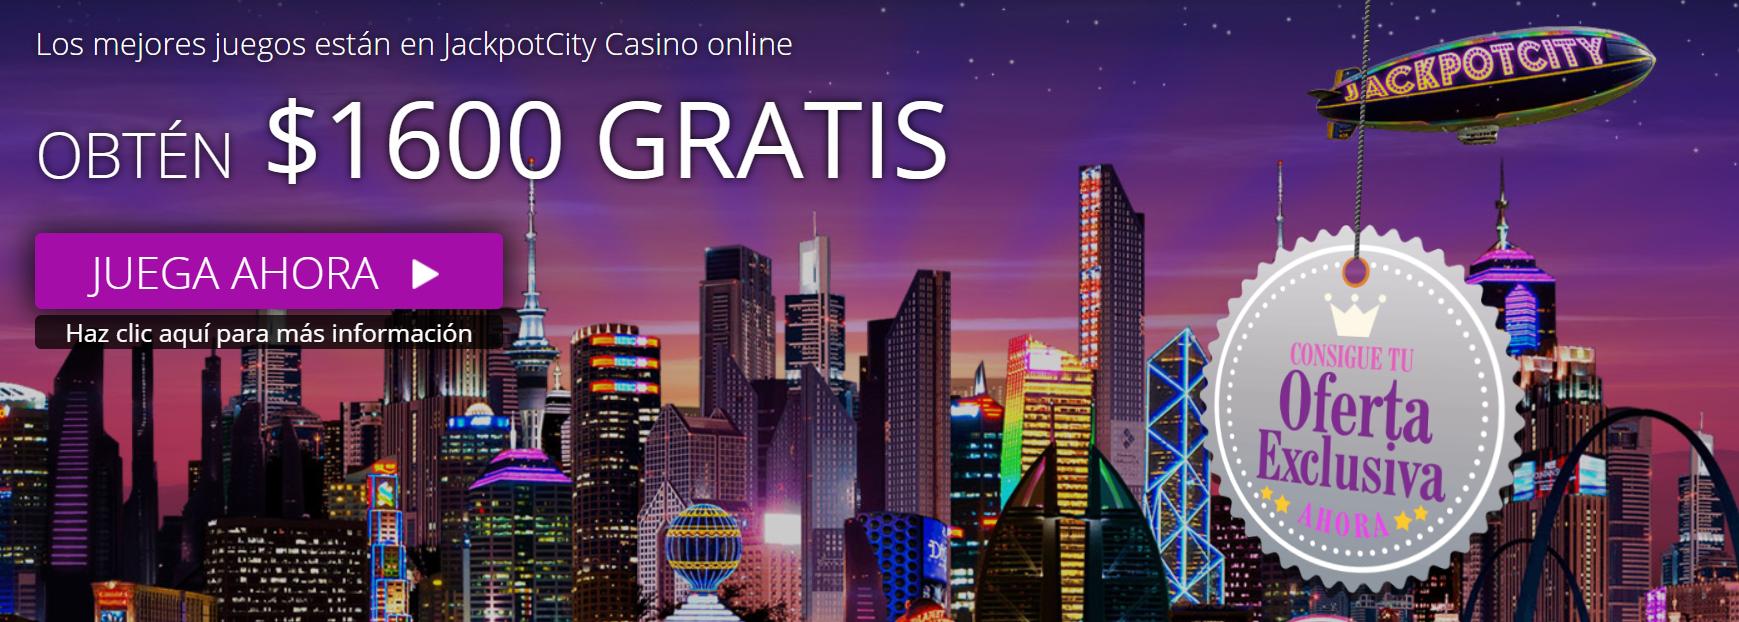 JackpotCity Online Casino - Reseña 3